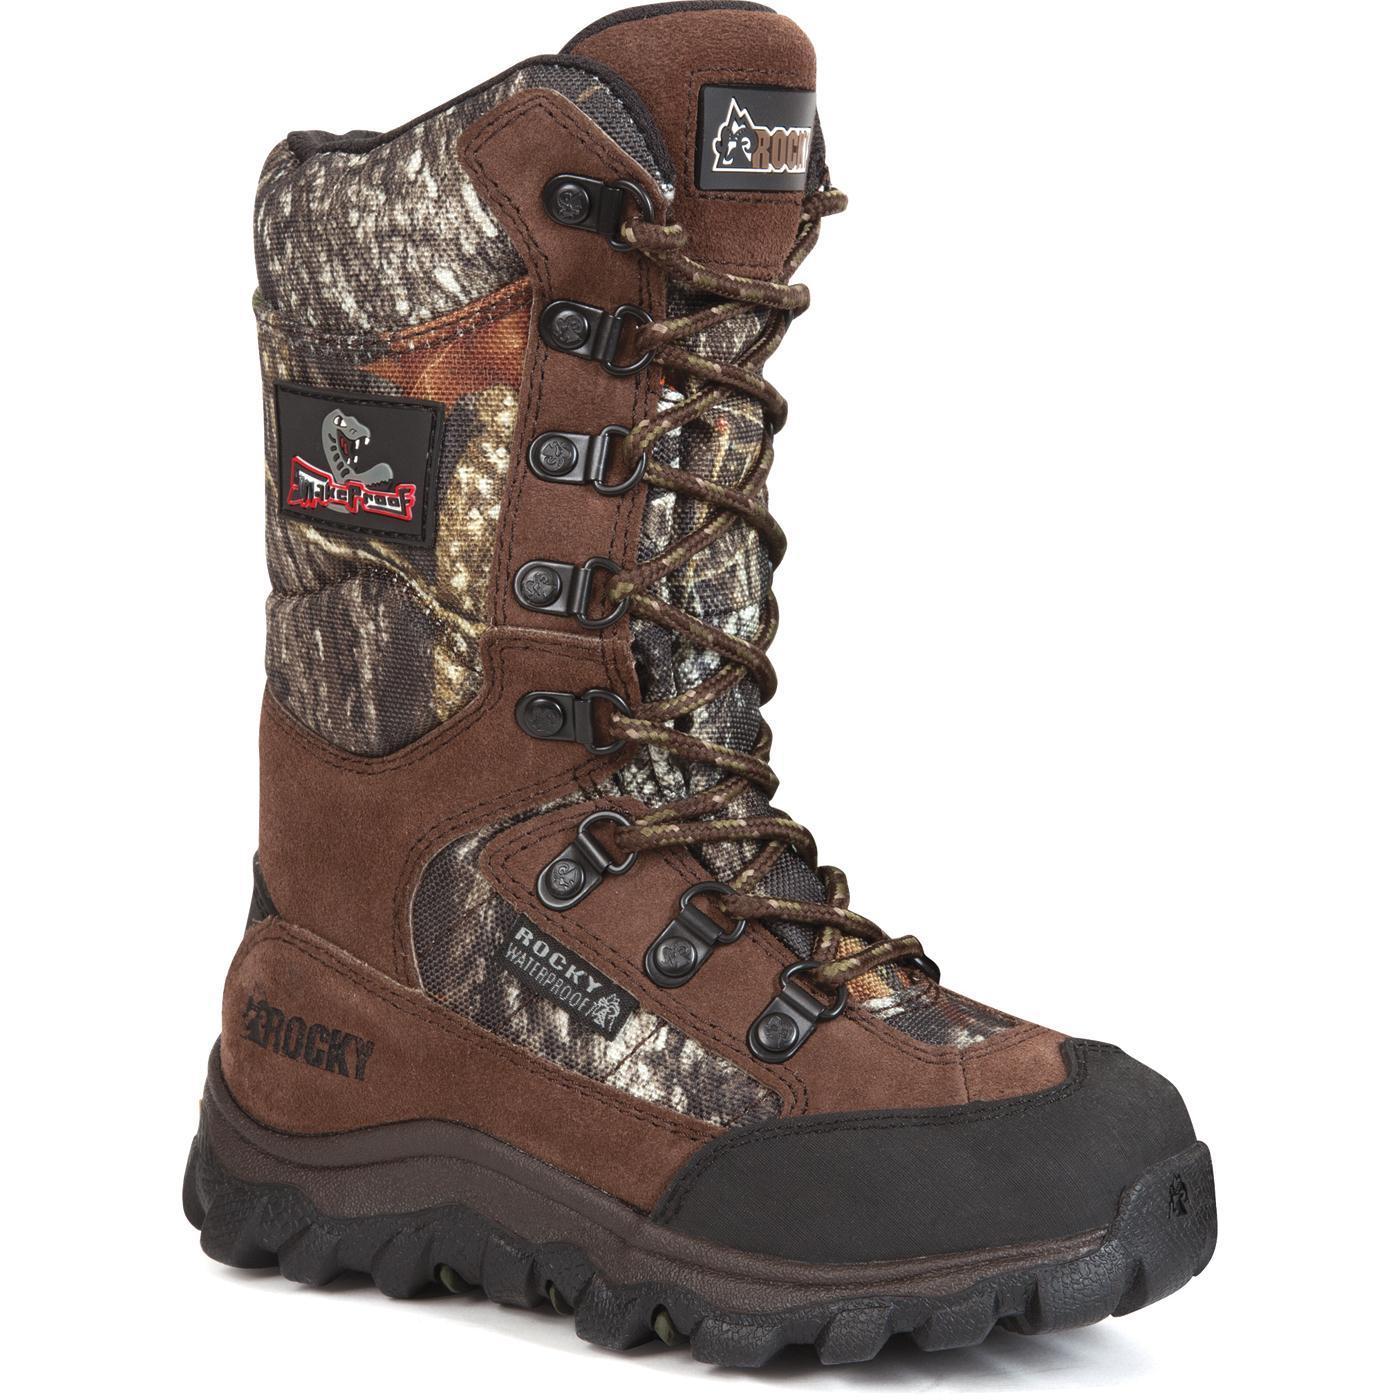 ad09572f9d2 3679 Rocky Lynx Waterproof Kid s Outdoor Boots